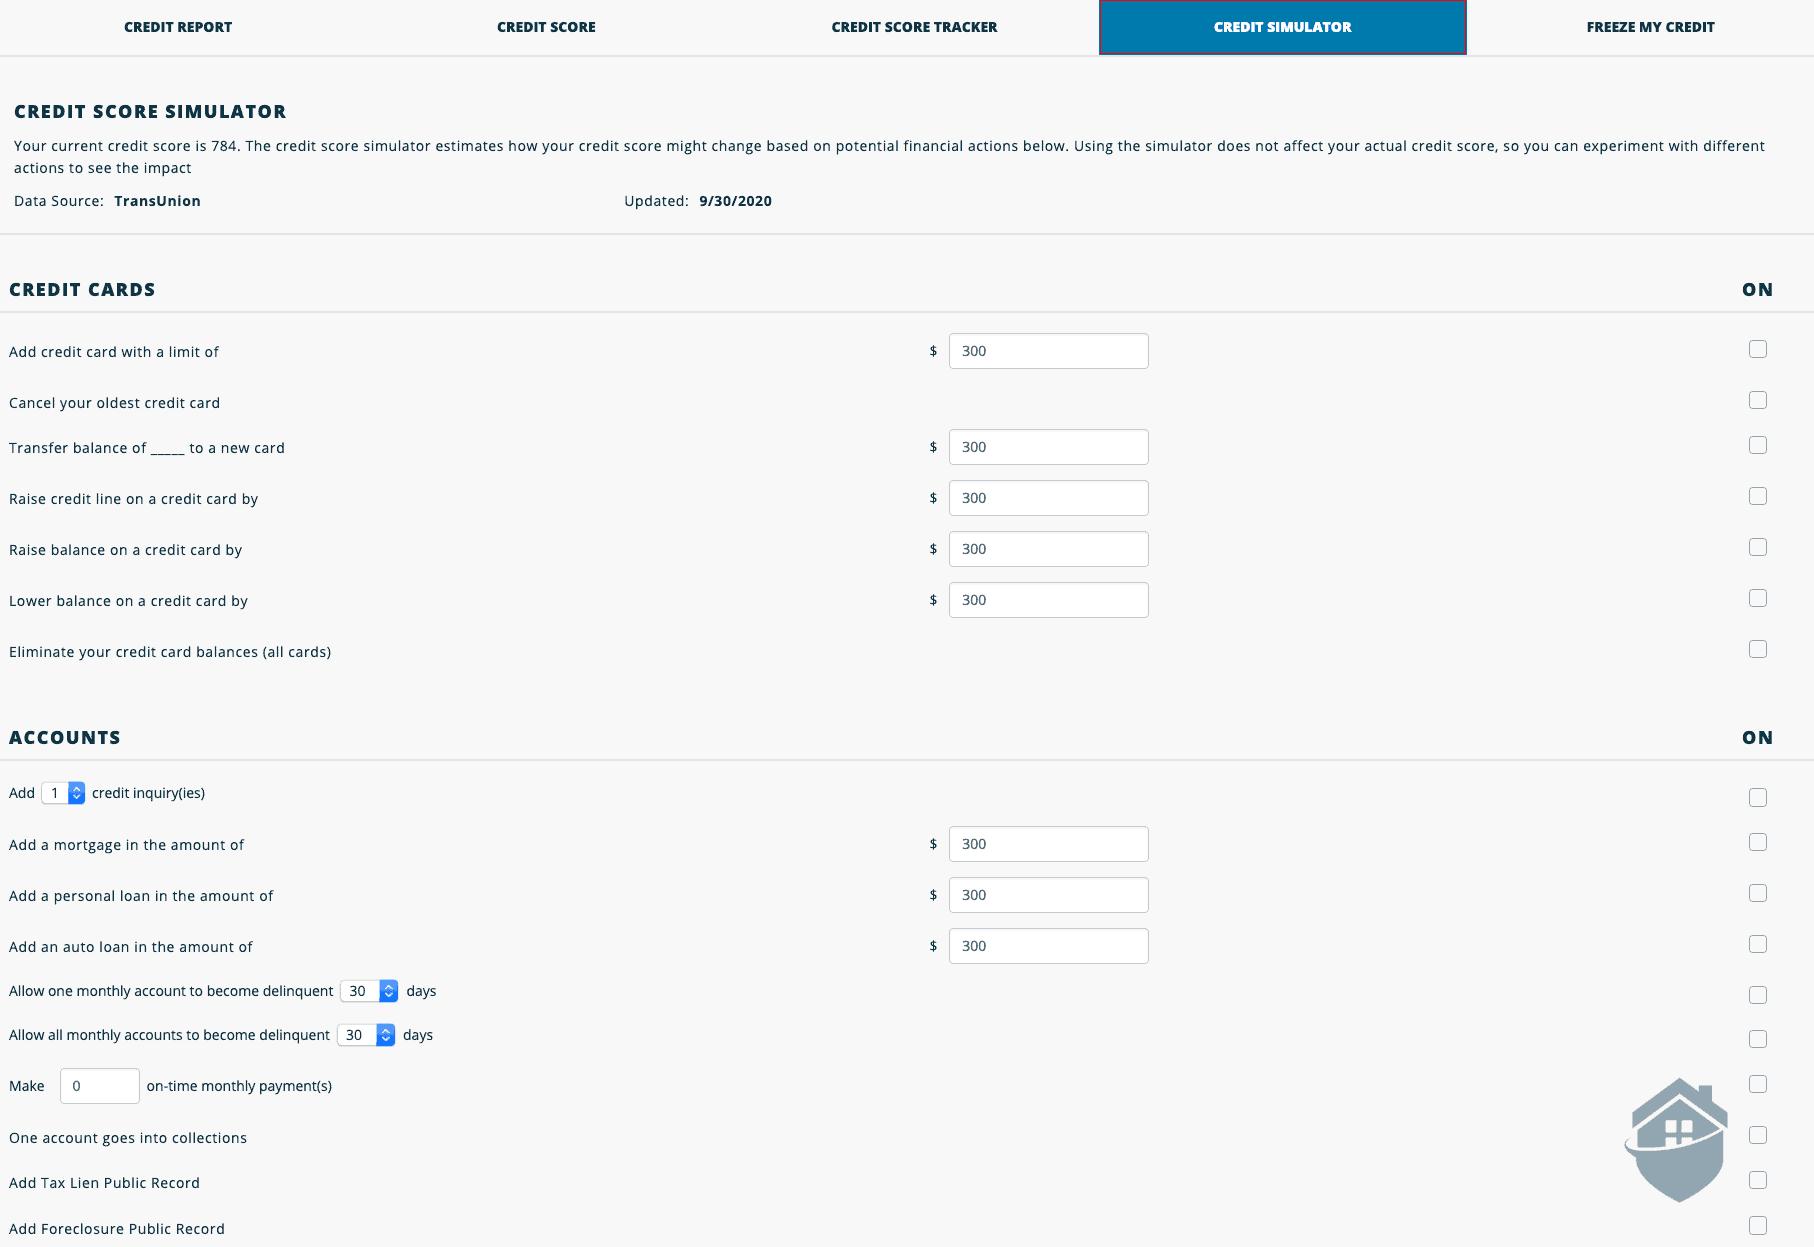 IdentityForce Credit Score Simulator